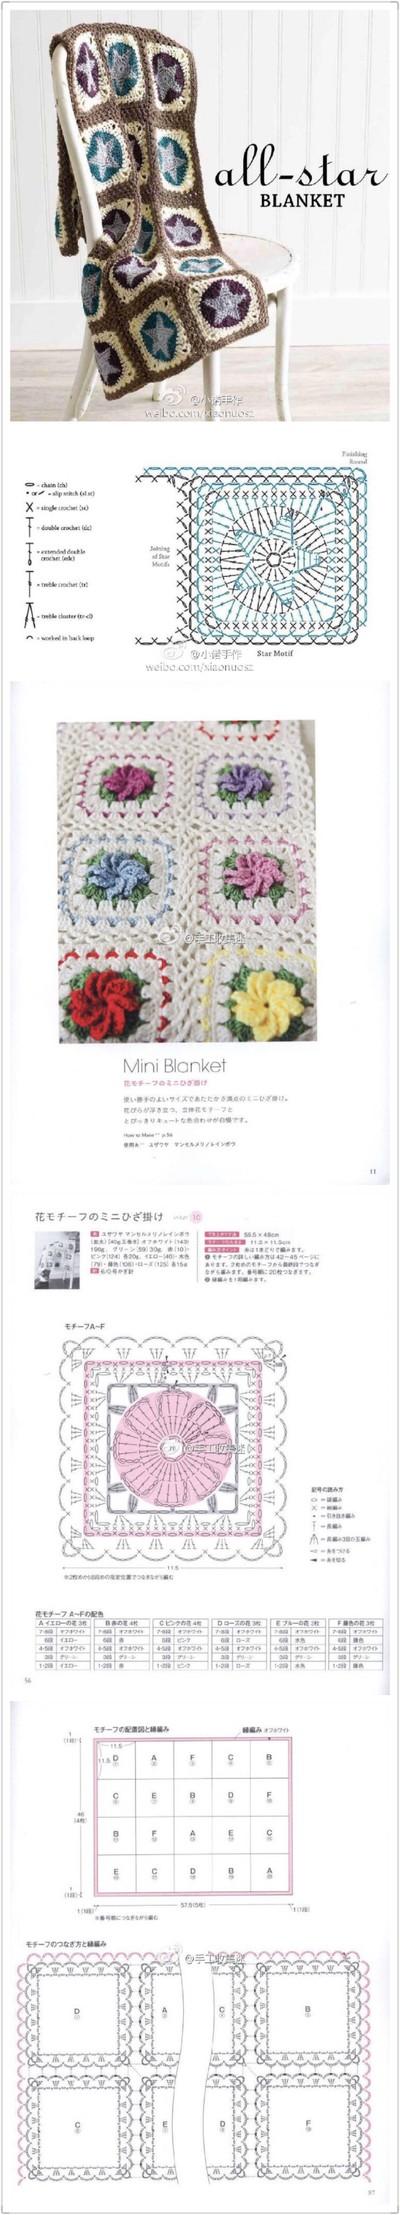 Mantas crochet patrón estrella | MANTAS ❇ | Pinterest | Crochet ...